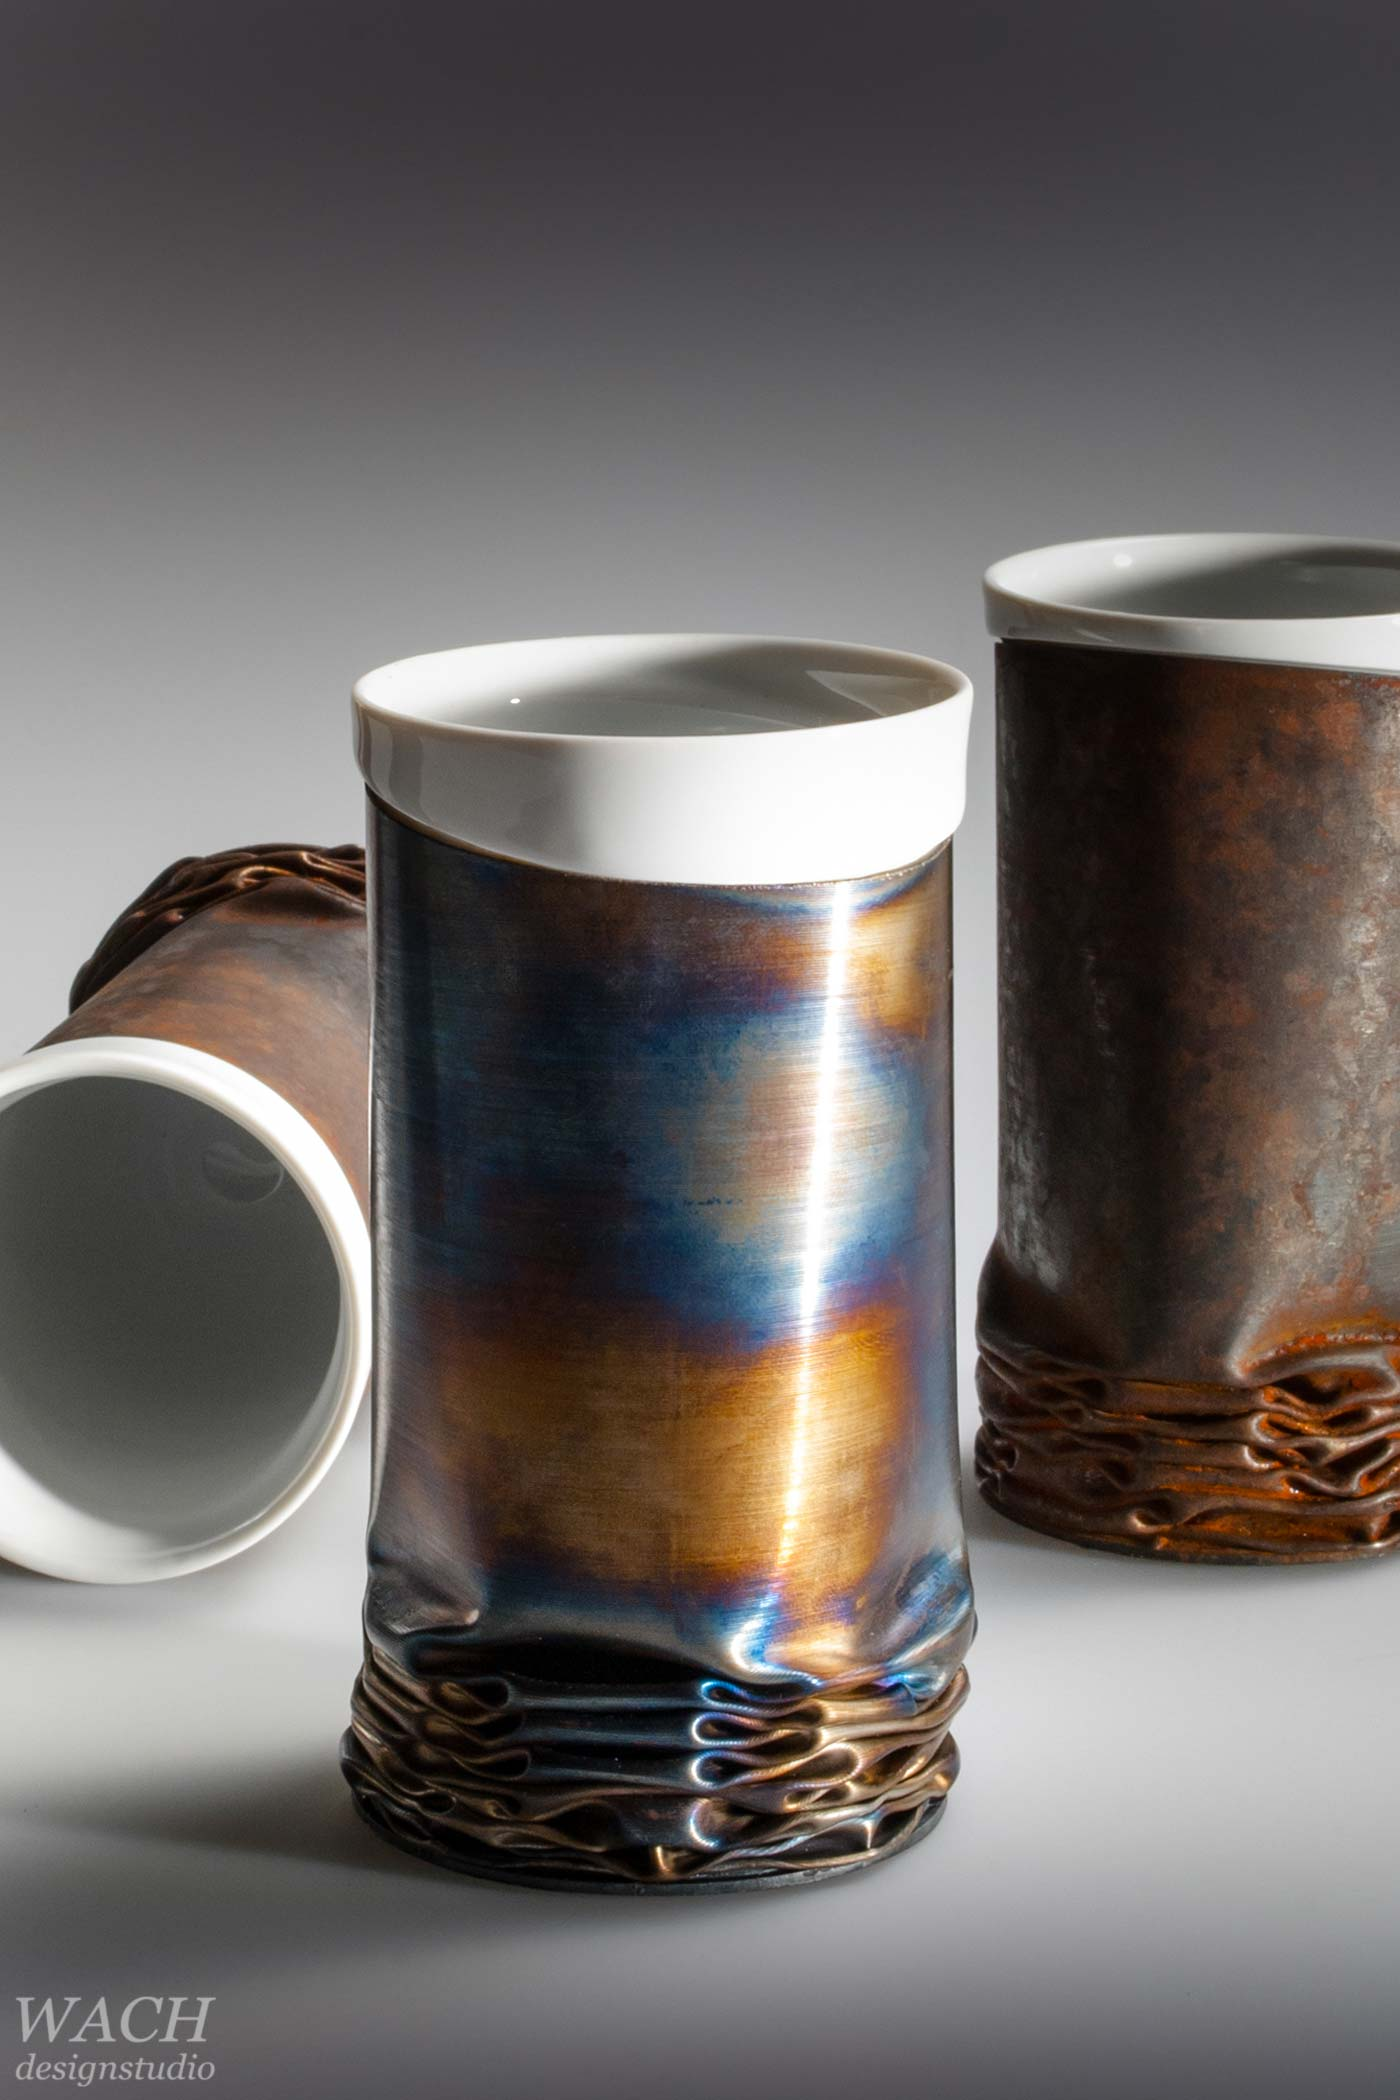 Rust Cup designed by WACH designstudio